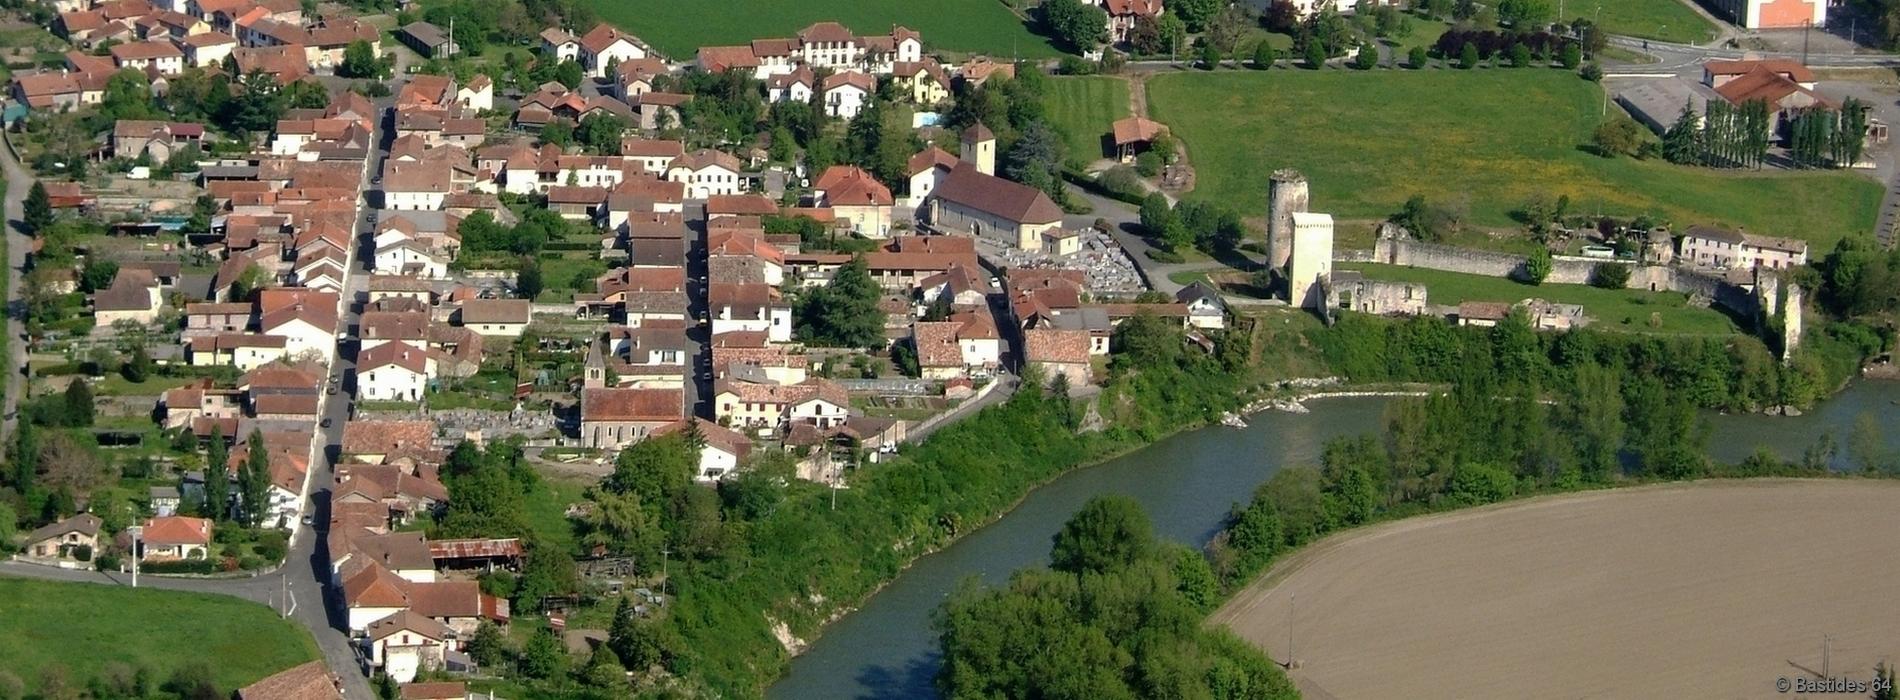 En Béarn avant 1300